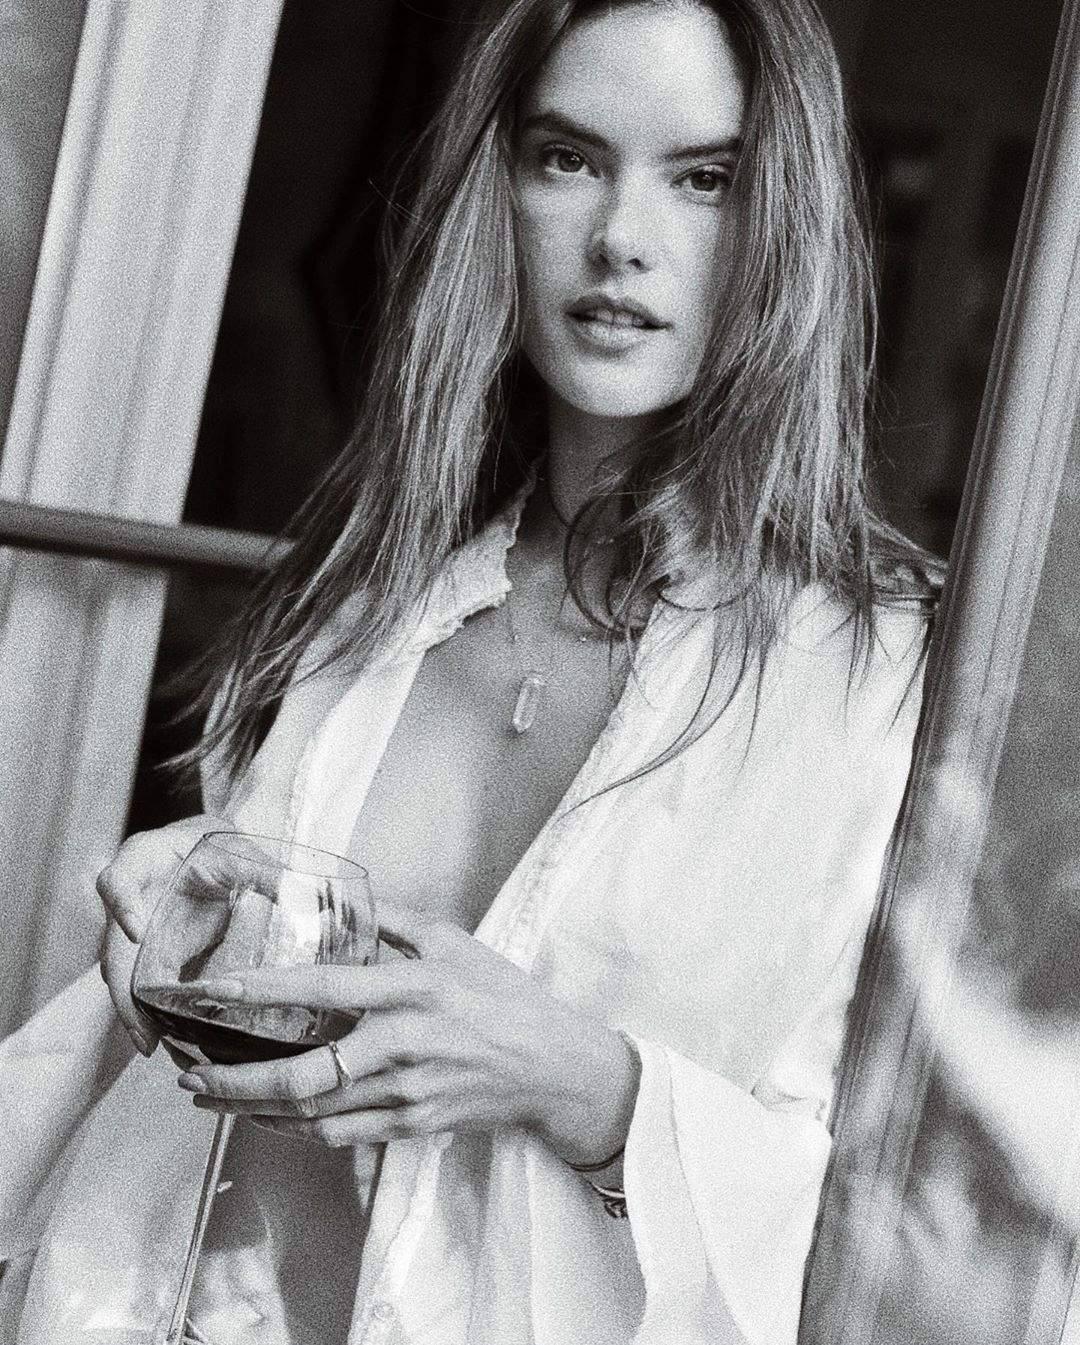 Alessandra Ambrosio – Sexy Sideboob In Hot Braless Photoshoot 0004